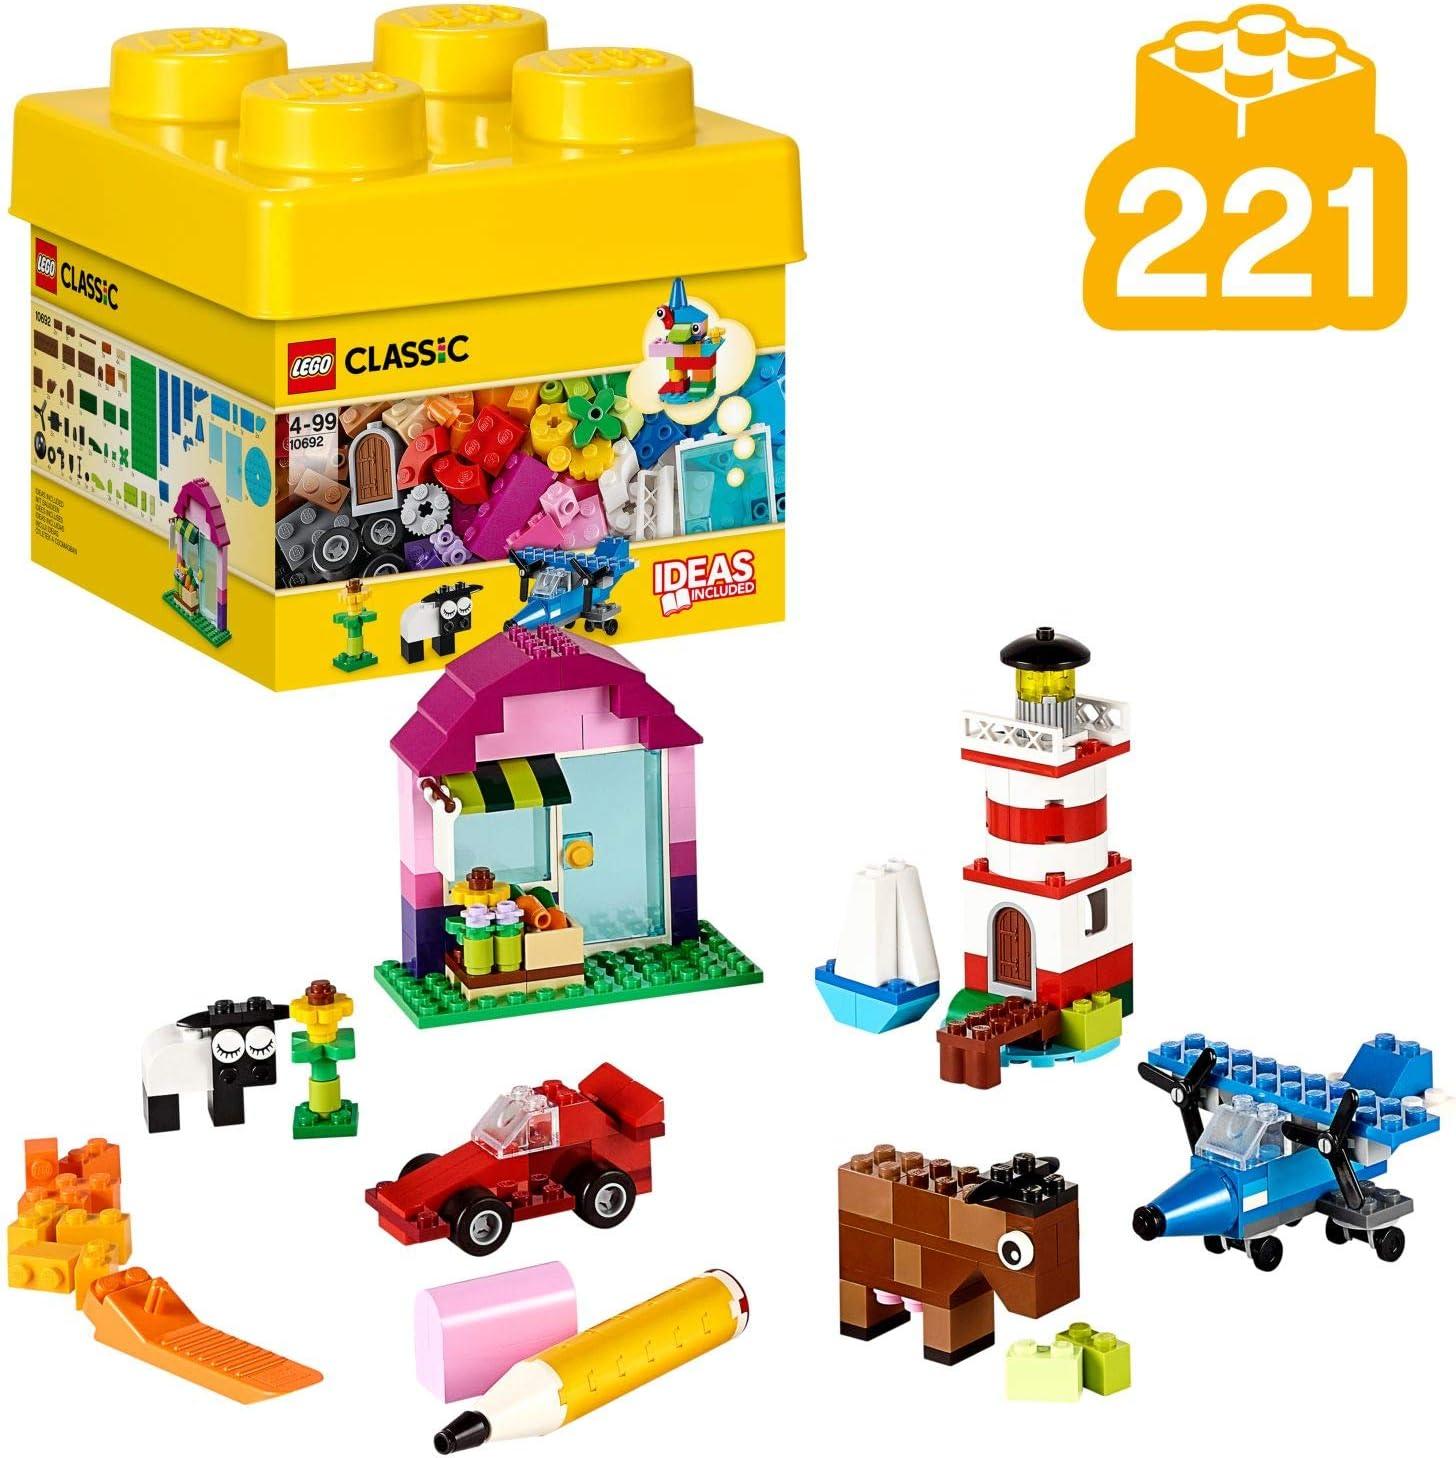 LEGO Classic - Ladrillos Creativos, Imaginativo Juguete de ...